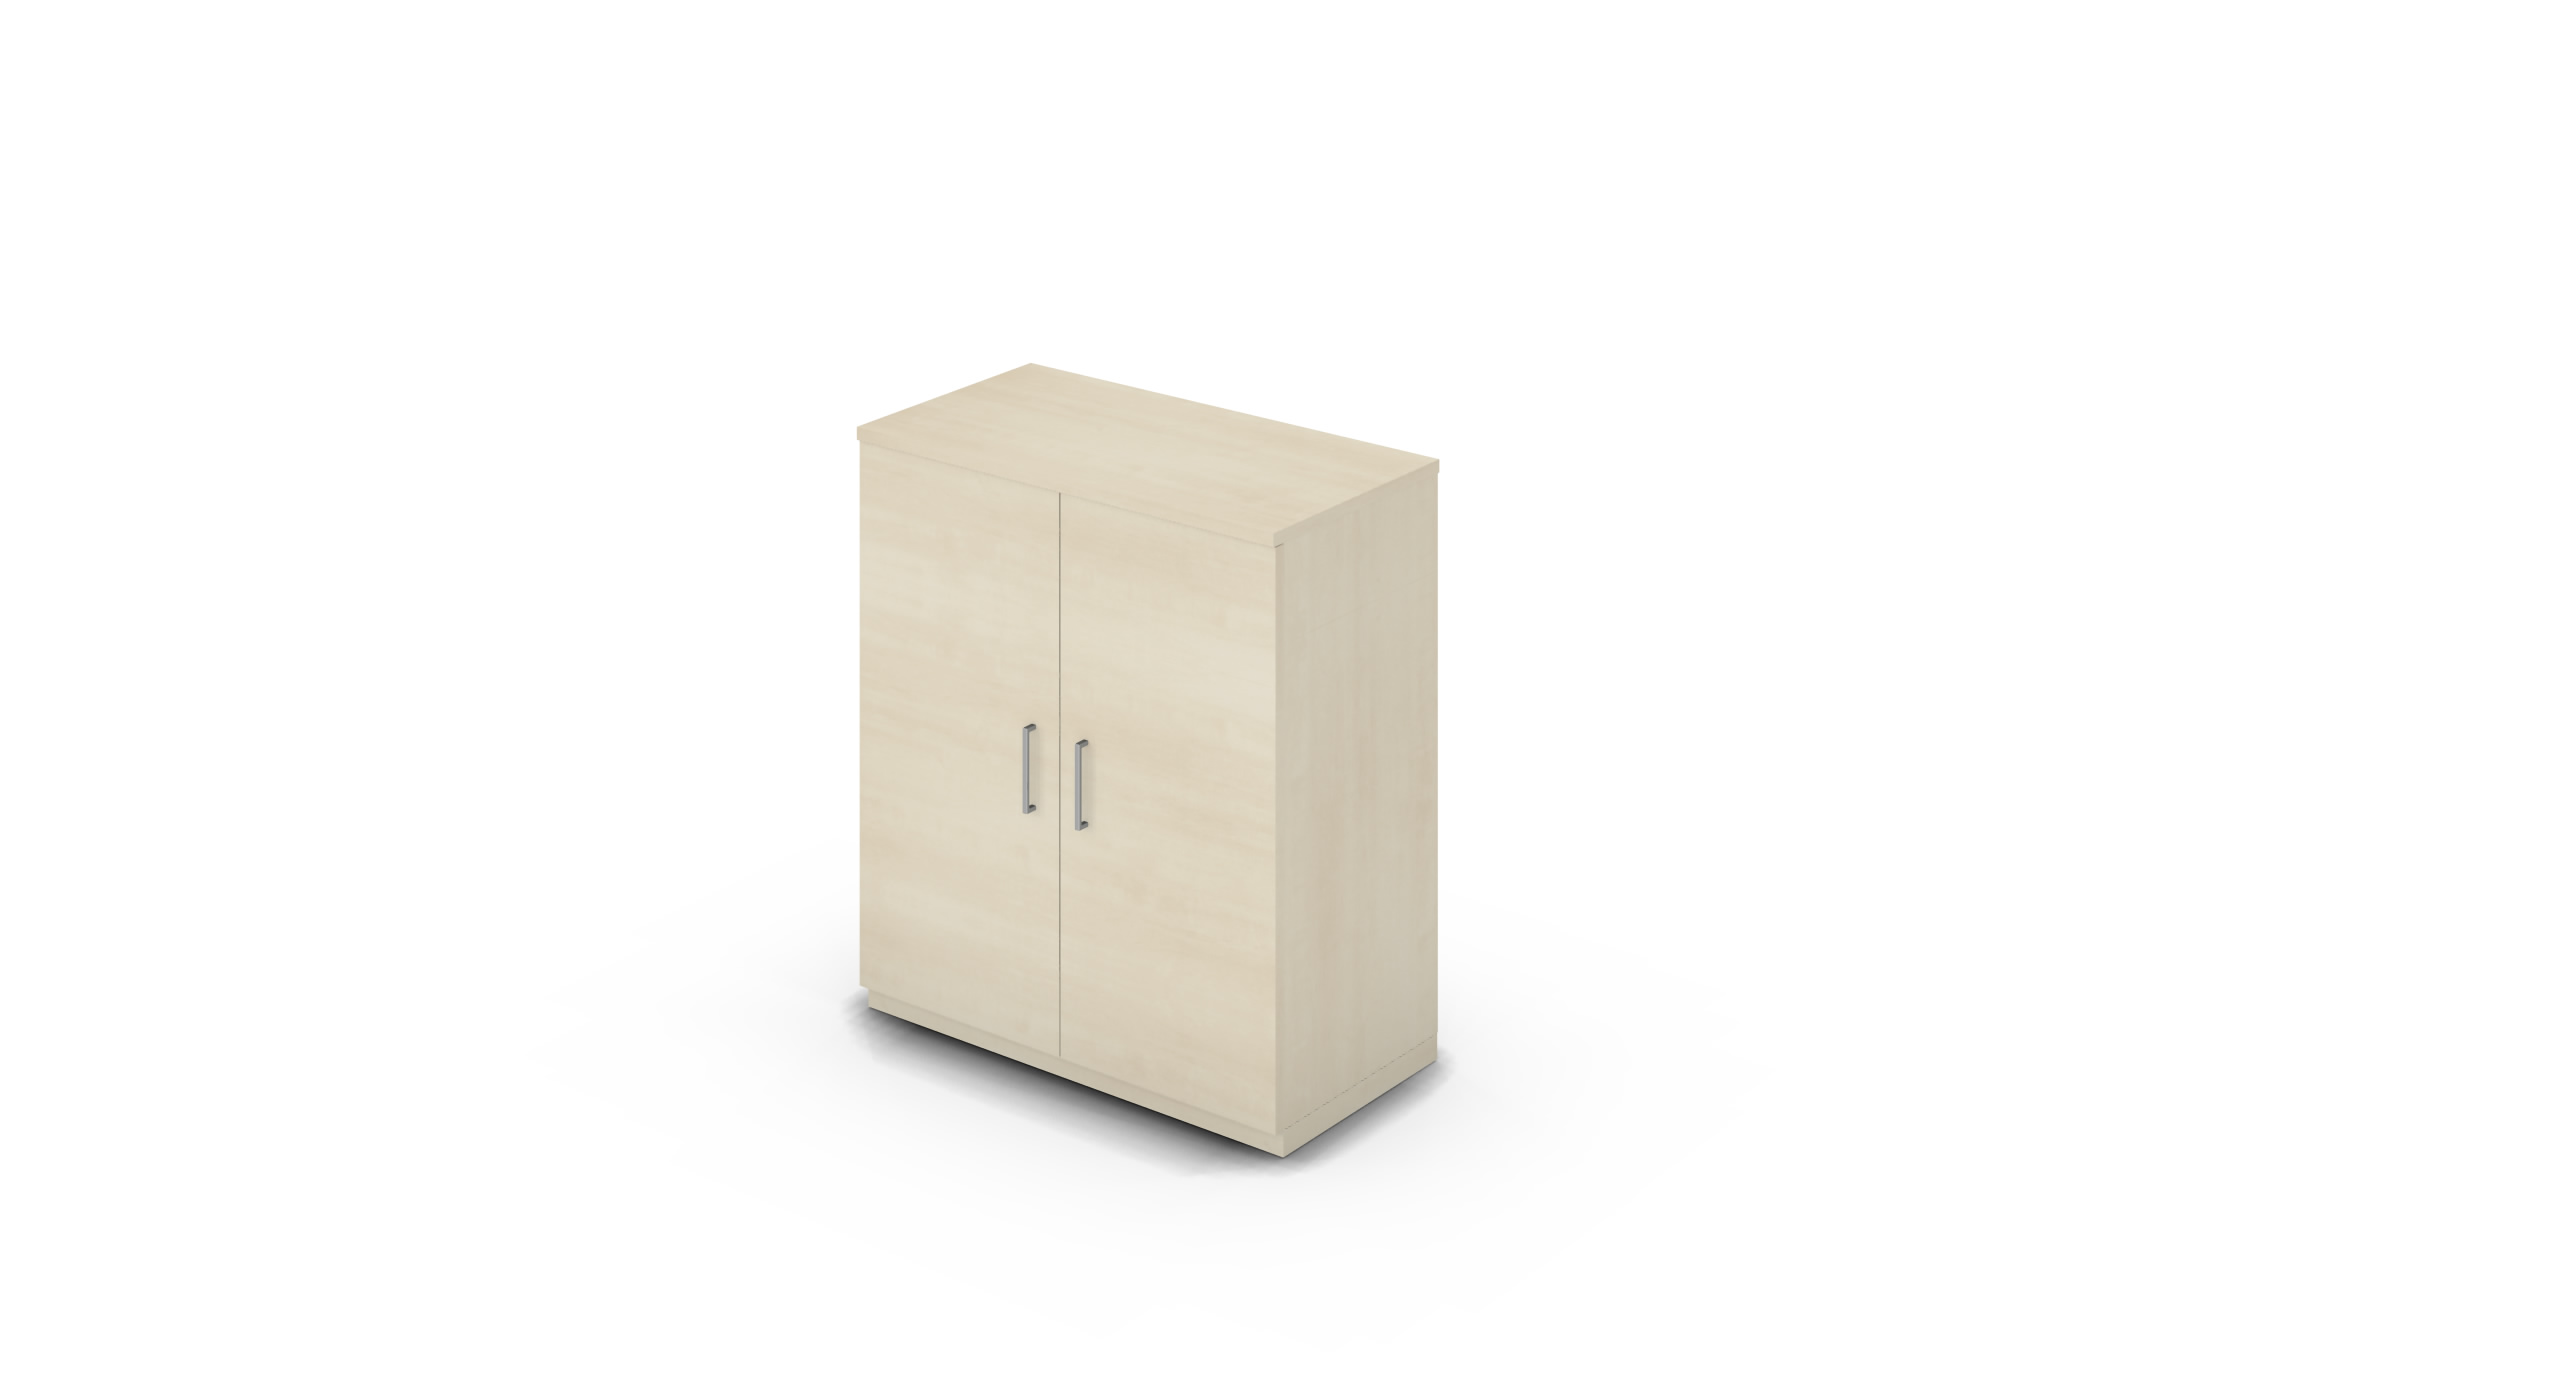 Cabinet_900x450x1125_HD_Maple_Bar_Square_NoCylinder